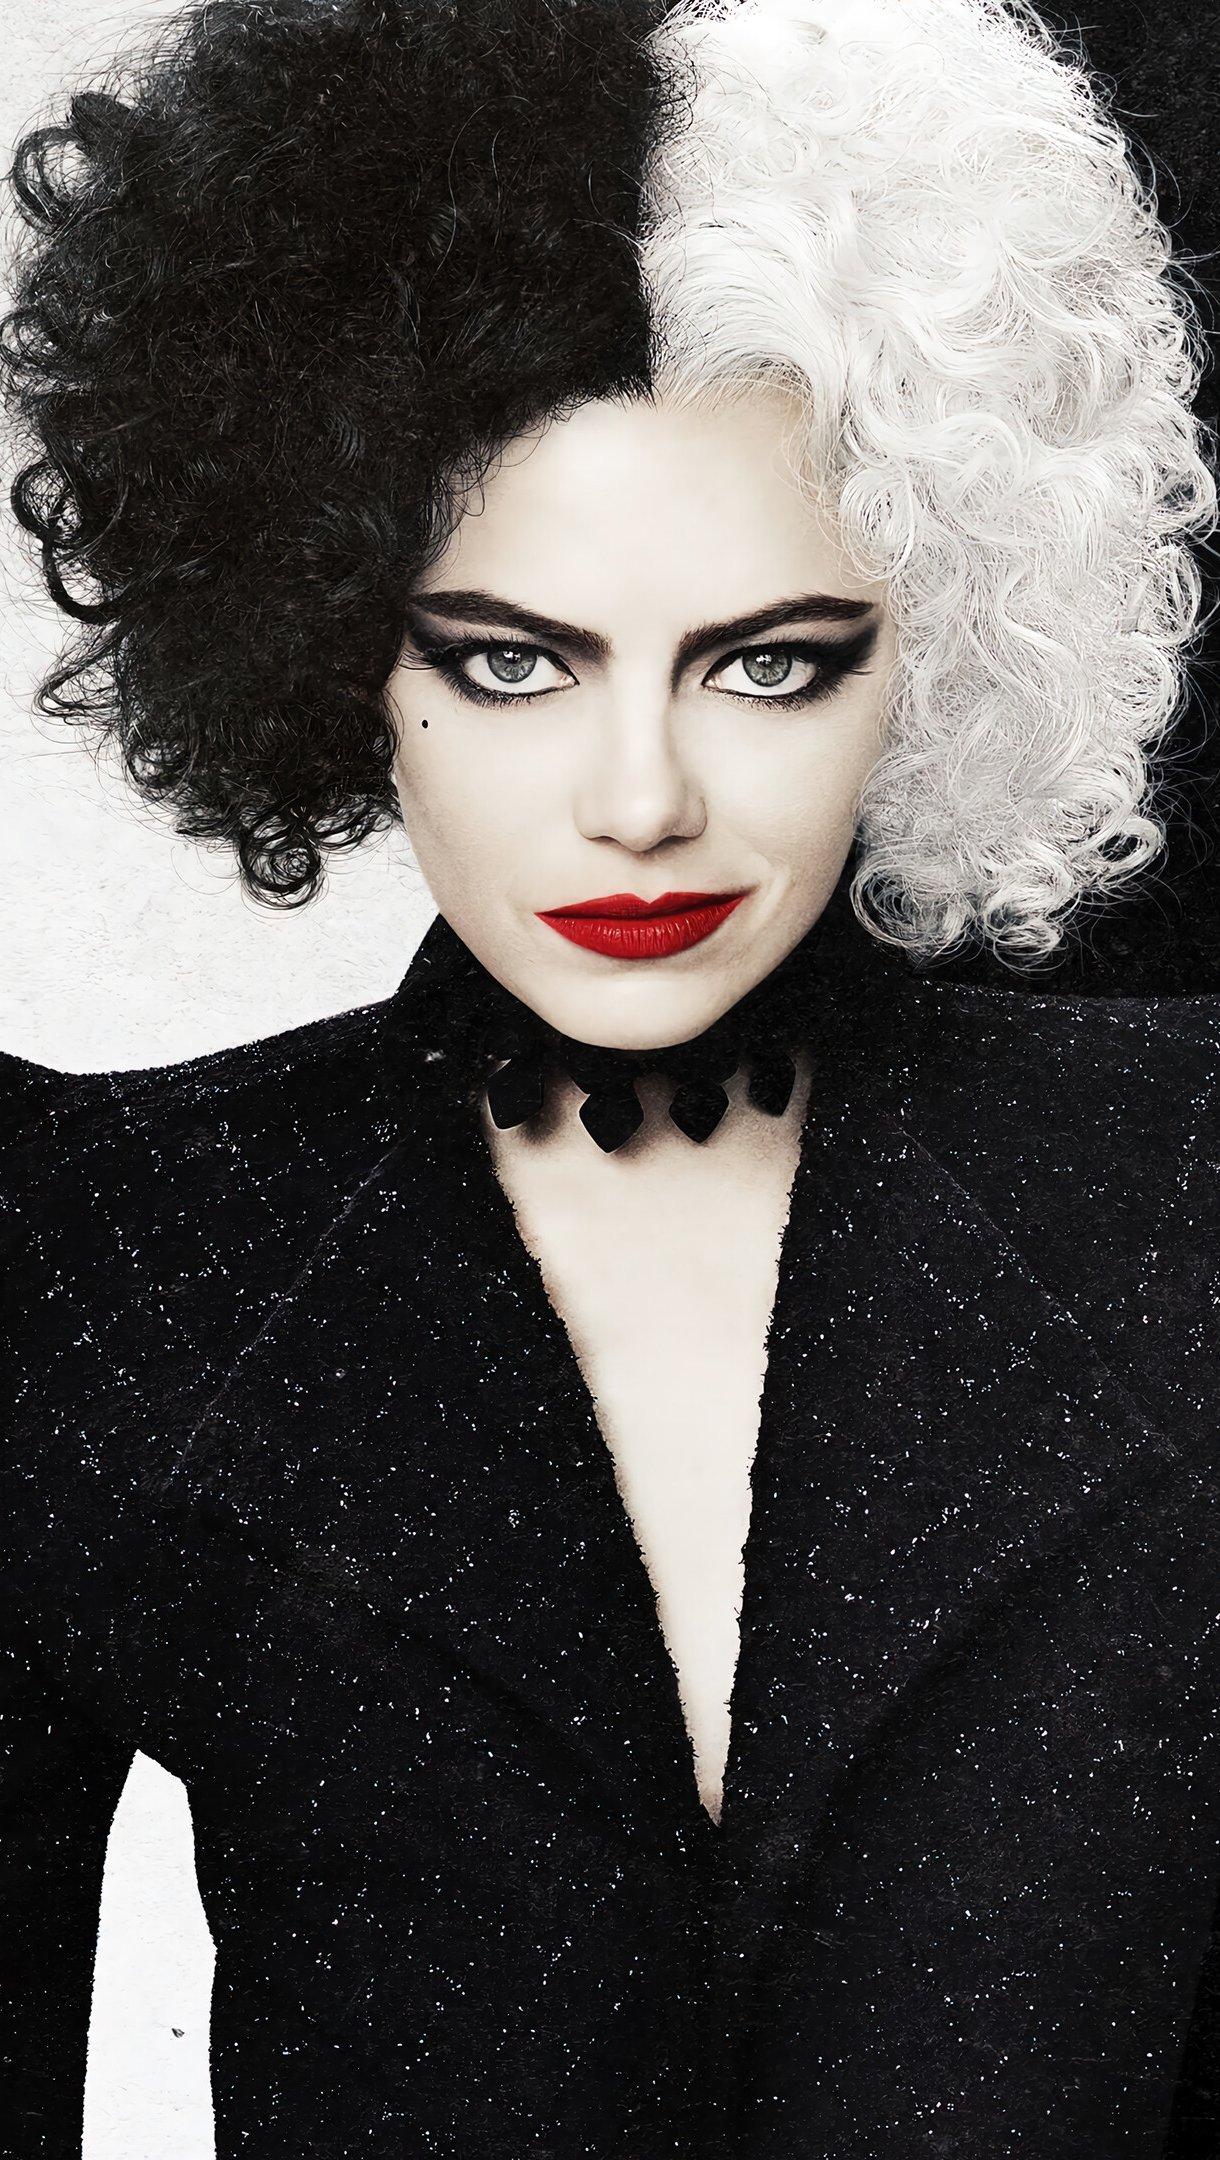 Fondos de pantalla Emma Stone como Cruella Vertical